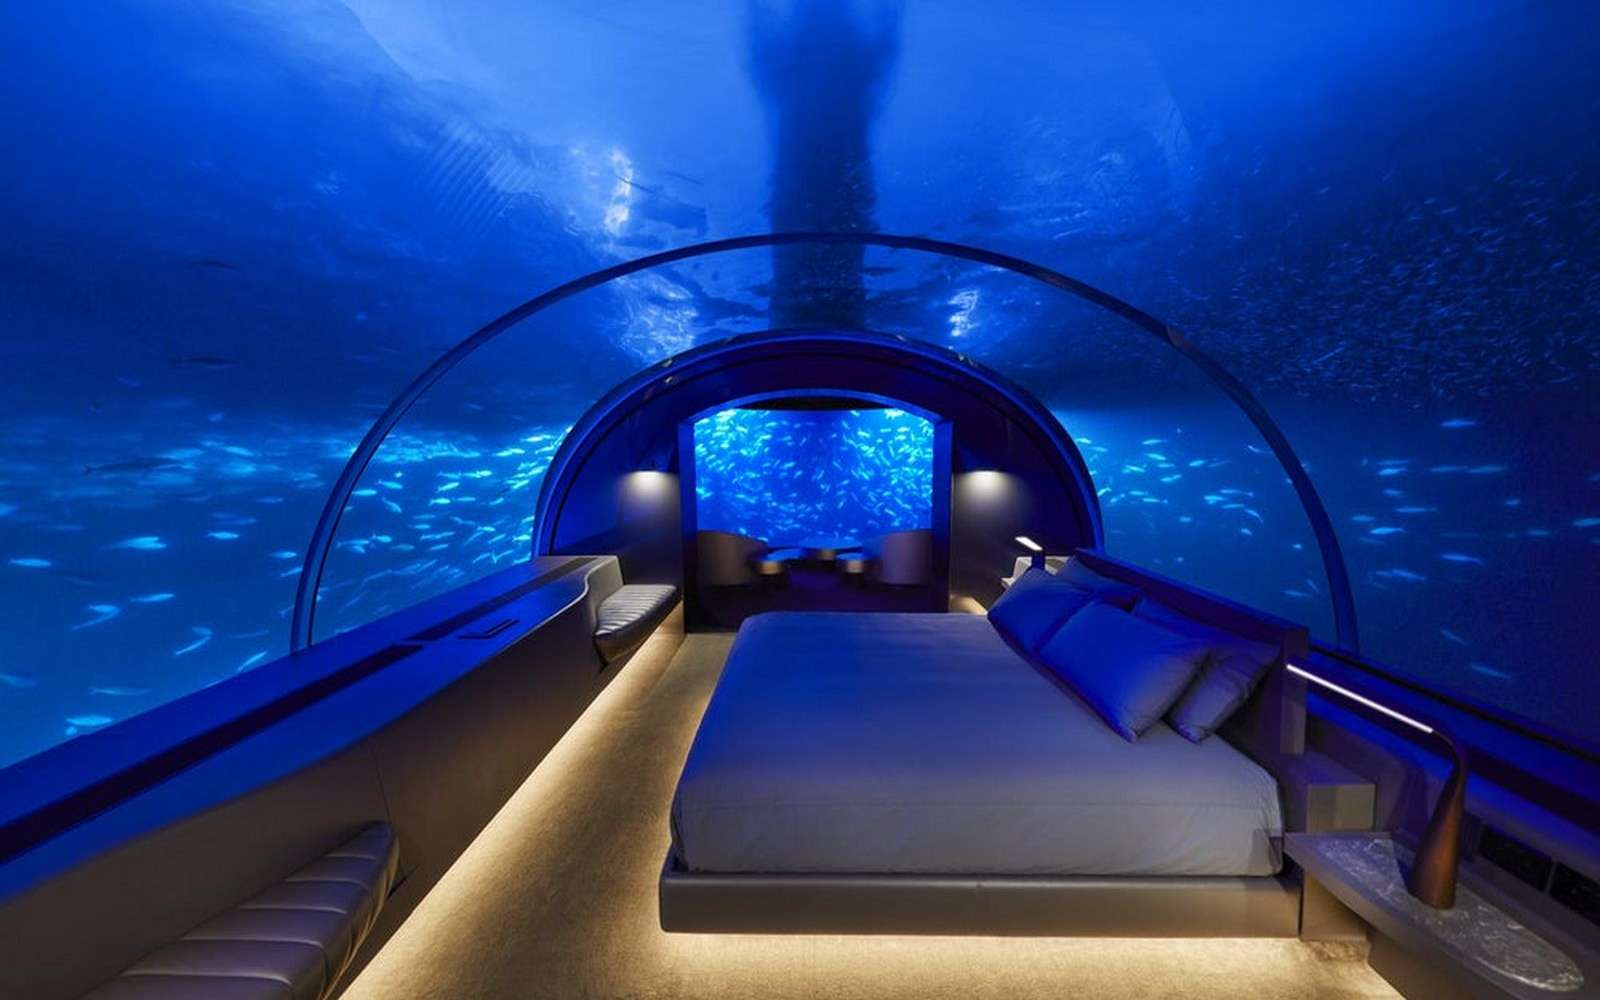 La suite sous-marine de l'hôtel Conrad Maldives Rangali Island. © Justin Nicholas